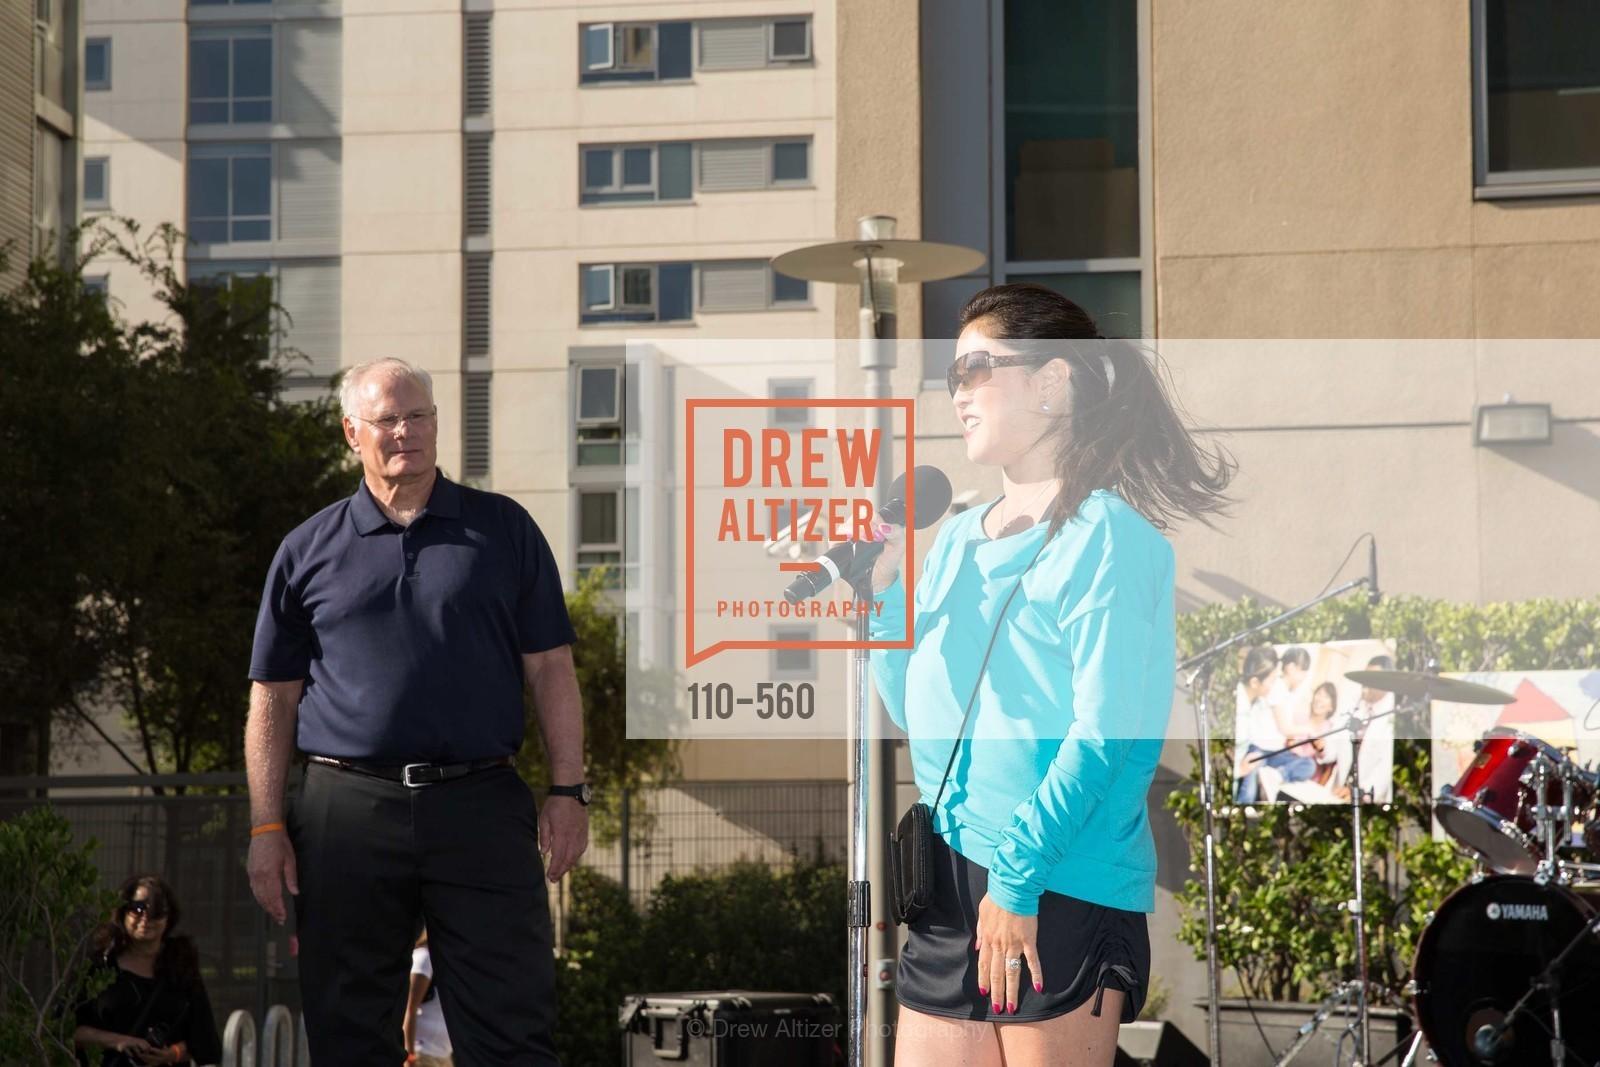 Mark Laret, Kristi Yamaguchi, UCSF Medical Center HARD HAT WALK & LIGHTS ON FESTIVAL, US, September 6th, 2014,Drew Altizer, Drew Altizer Photography, full-service agency, private events, San Francisco photographer, photographer california